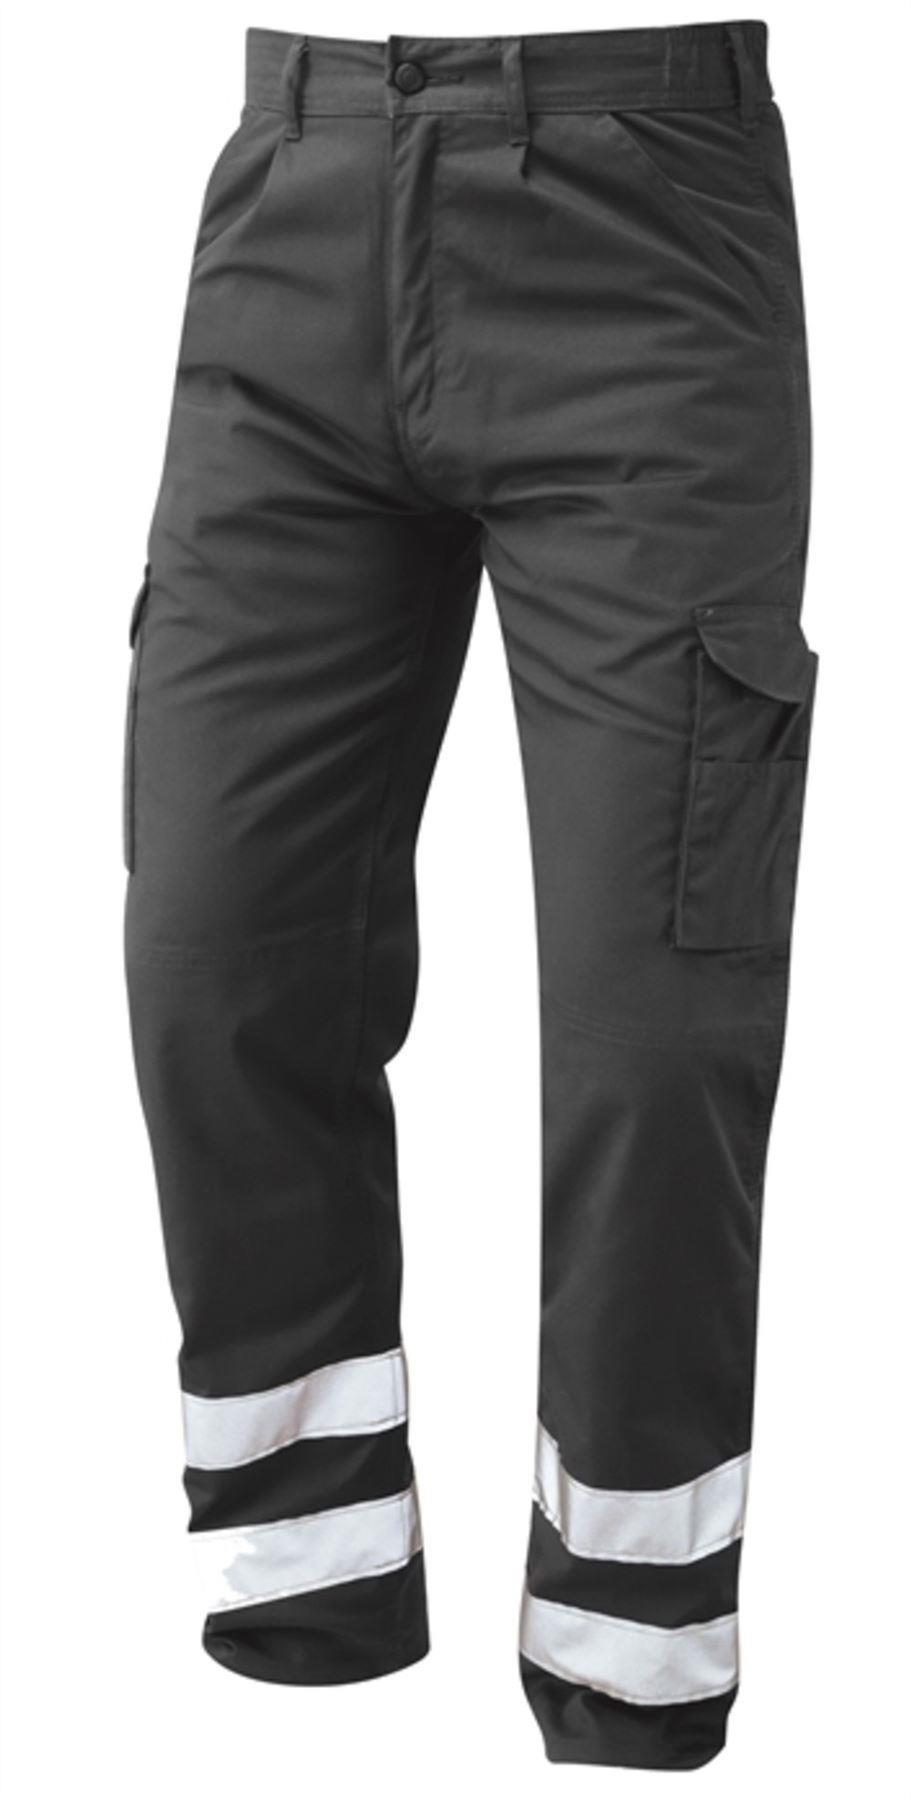 Orn Condor Hi Vis Kneepad Trousers - Graphite Grey|42W29L